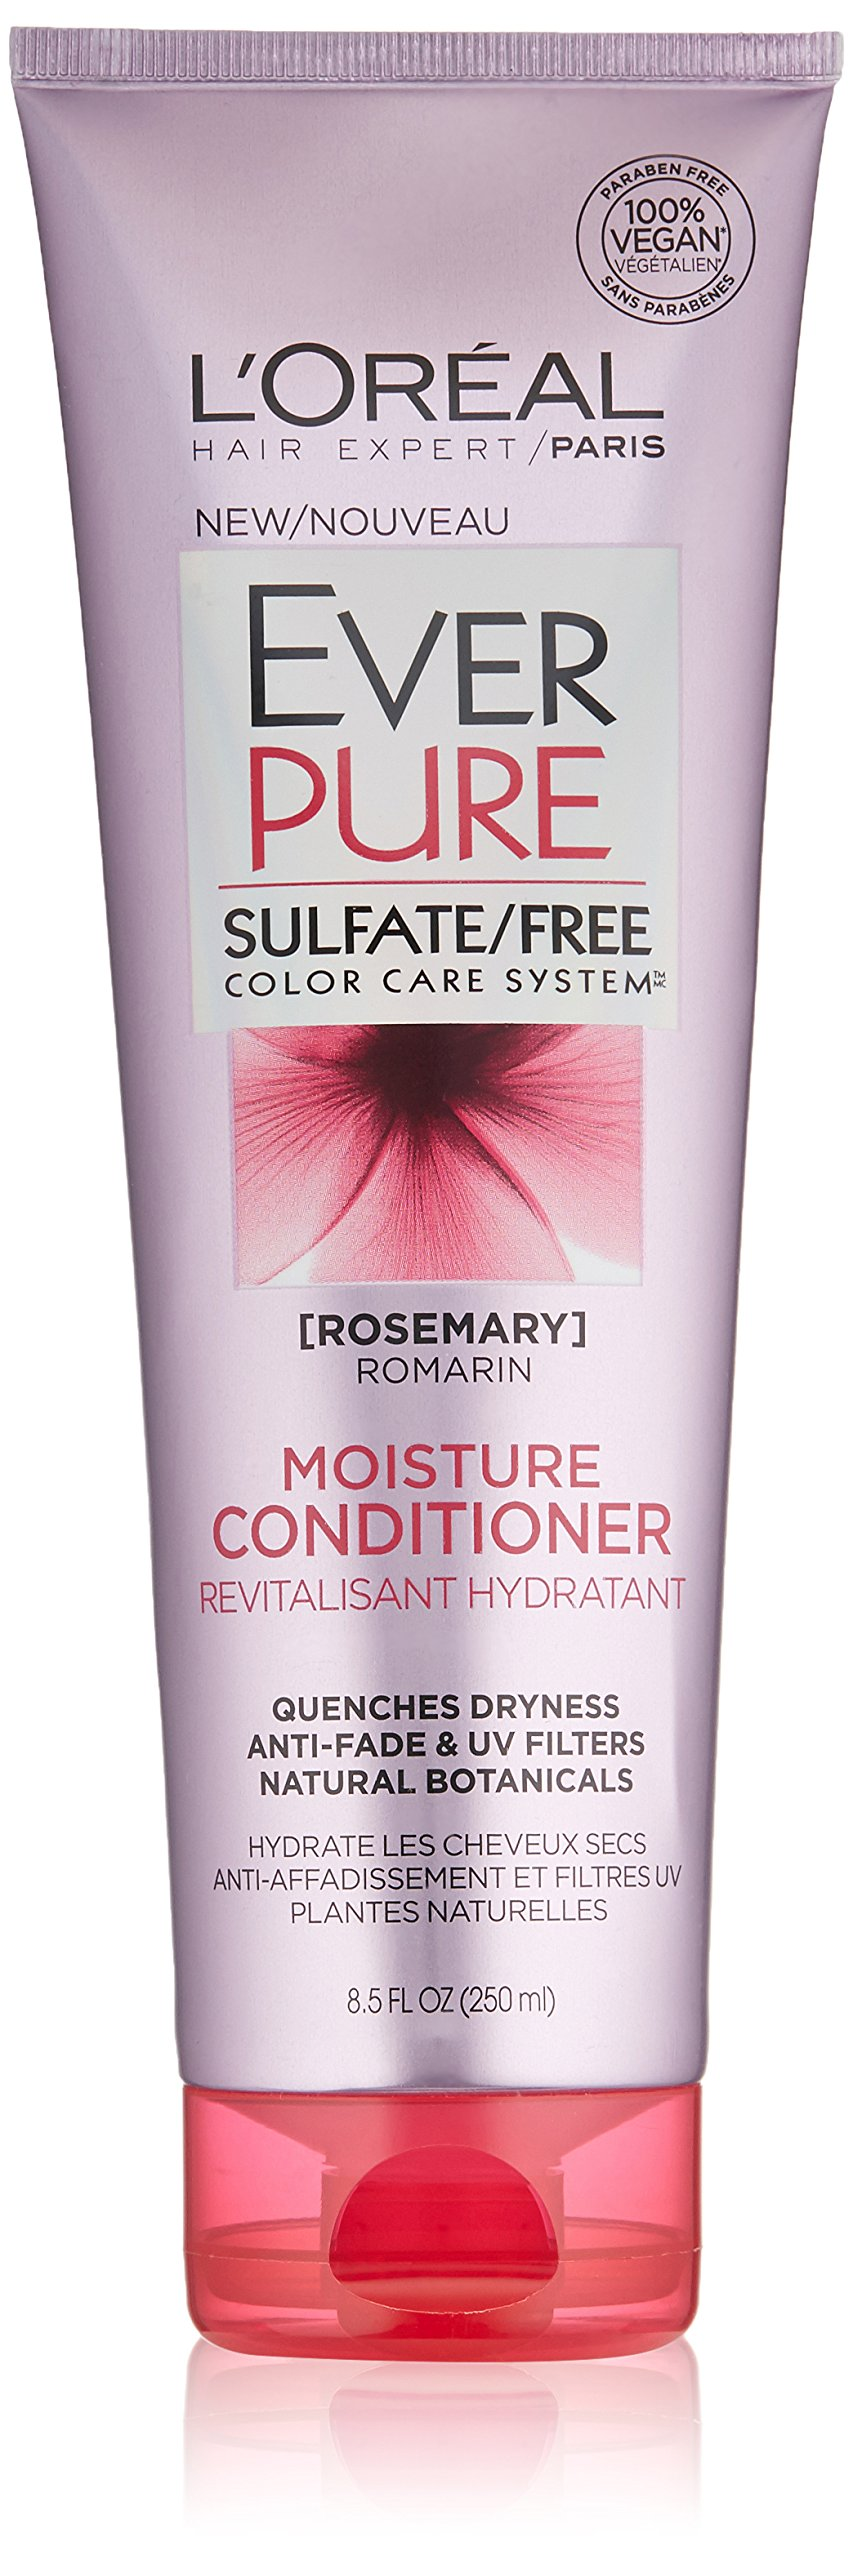 L'Oreal Paris Hair Care Ever Pure Moisture Conditioner, 8.5 Fluid Ounce